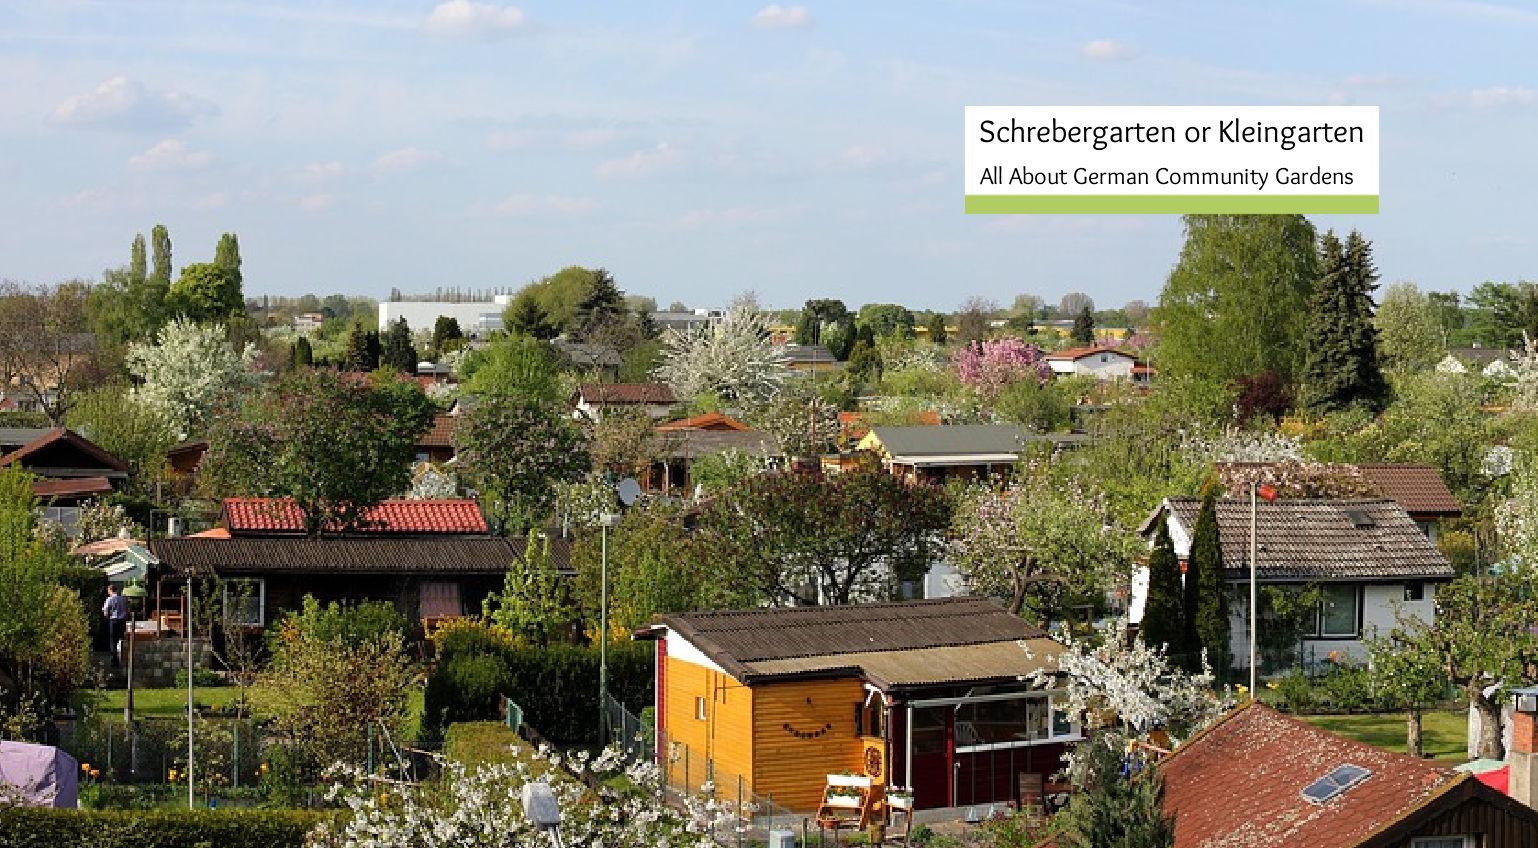 What is a Schrebergarten or Kleingarten? Germany's Little Gardens